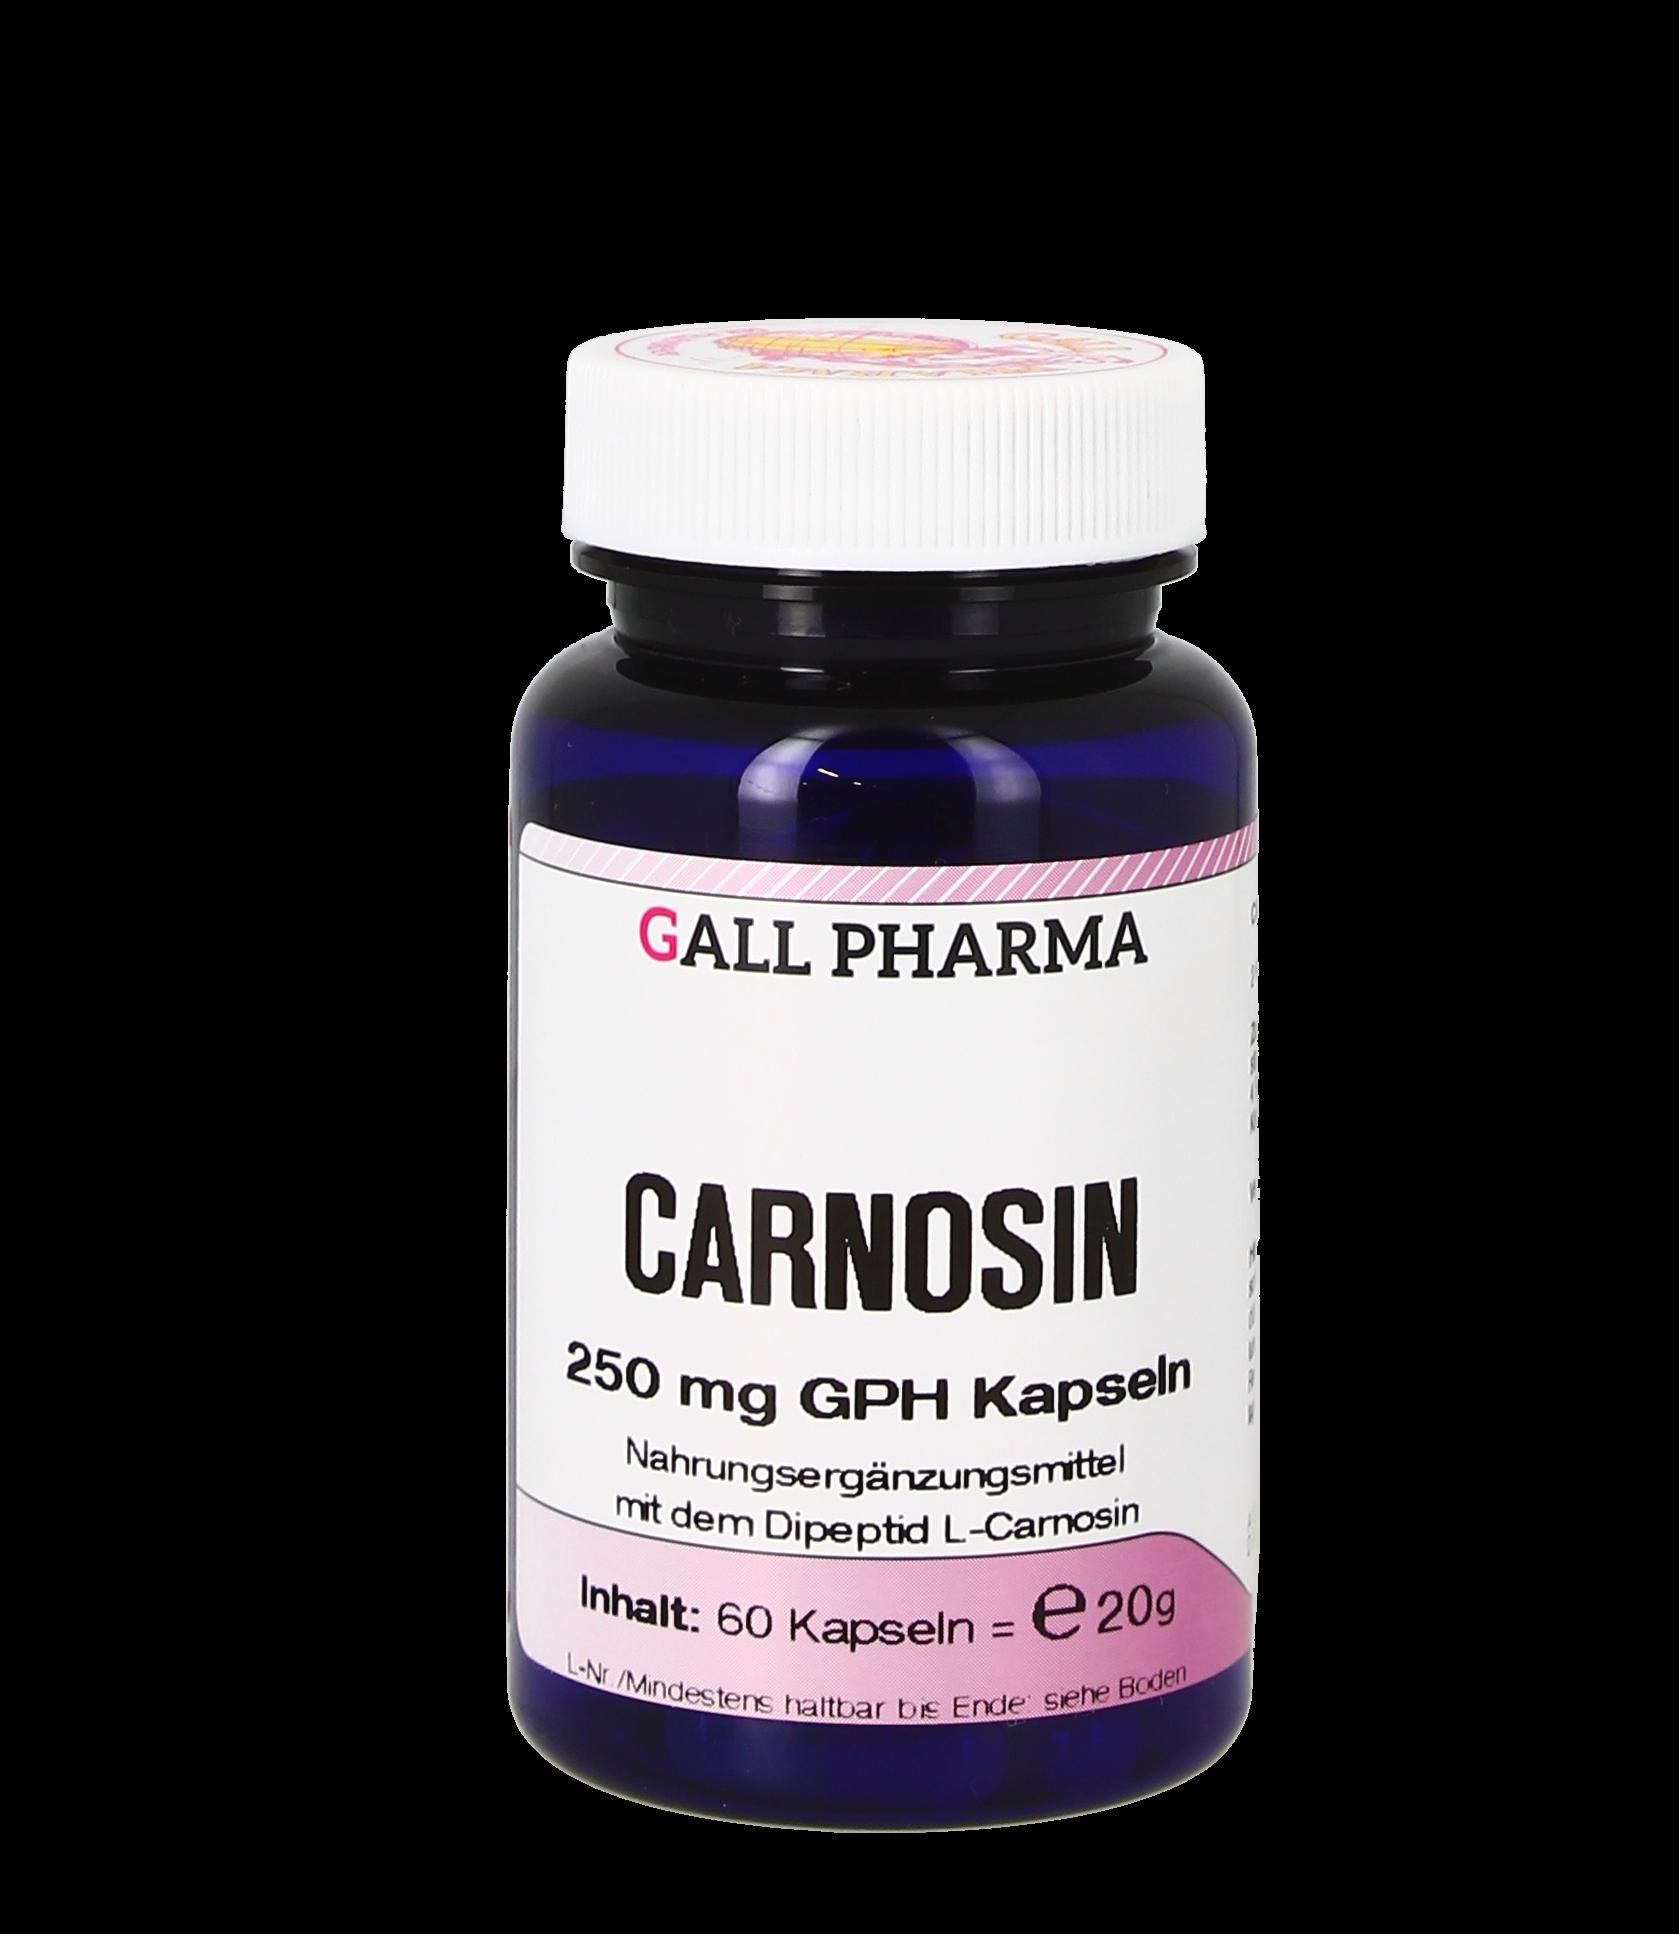 Carnosin 250 mg GPH Kapseln